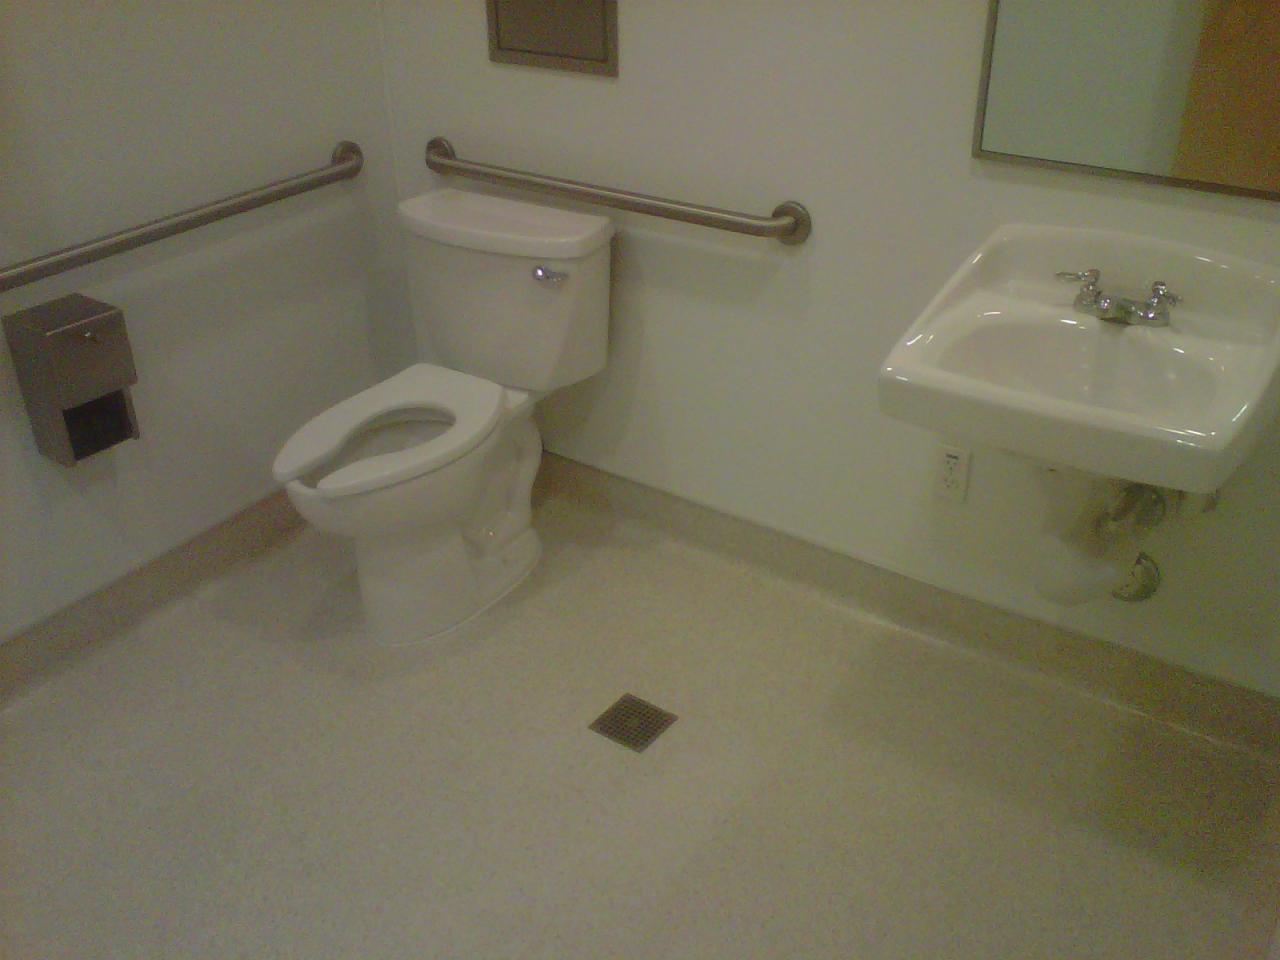 Bathroom Remodel San Diego >> San Diego Plumber - ReCENT ProjectSPeet's Coffee Westfiled Plaza BonitaNew Custom Build Home